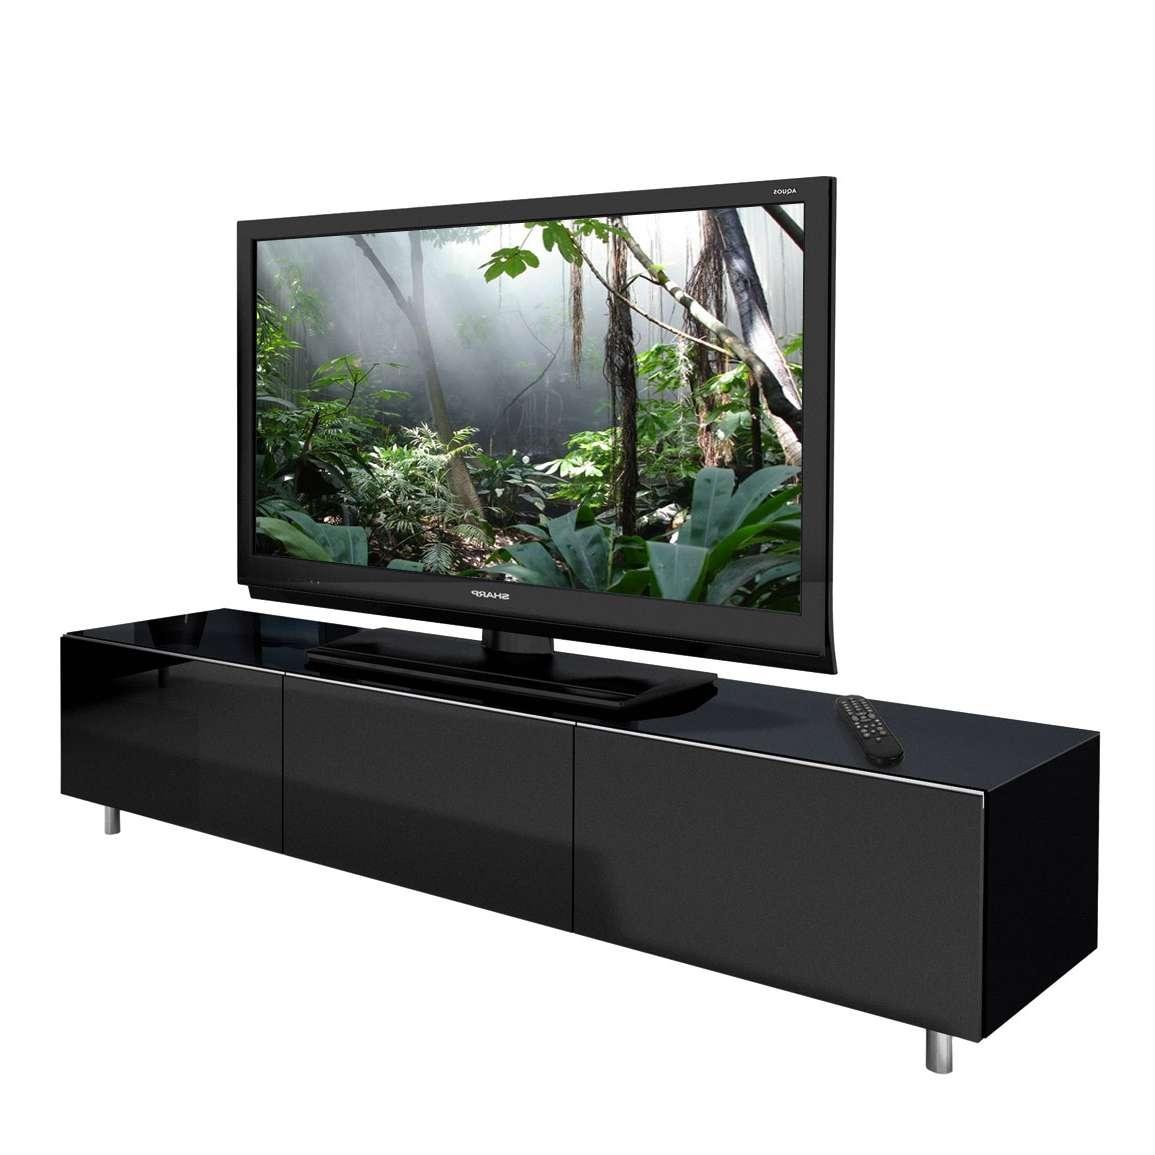 Just Racks Jrl1650 Gloss Black Tv Cabinet – Black Tv Stands Regarding Black Gloss Tv Stands (Gallery 8 of 20)